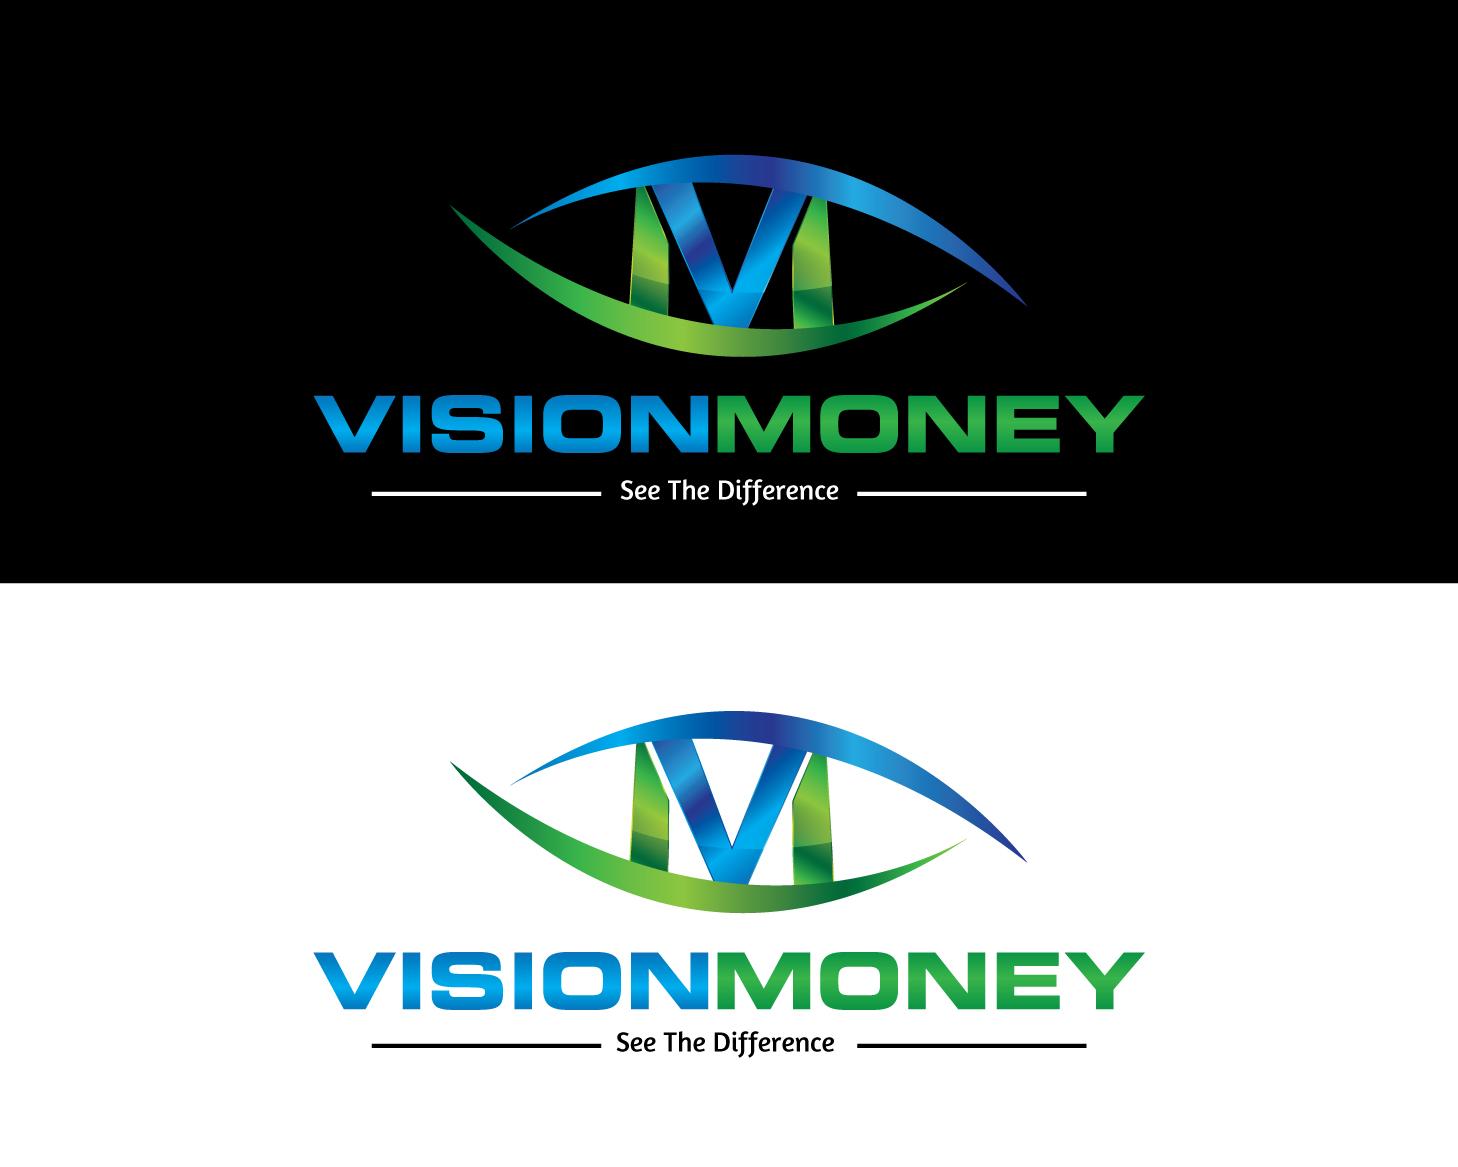 Logo Design by rA - Entry No. 54 in the Logo Design Contest Captivating Logo Design for VISION MONEY.